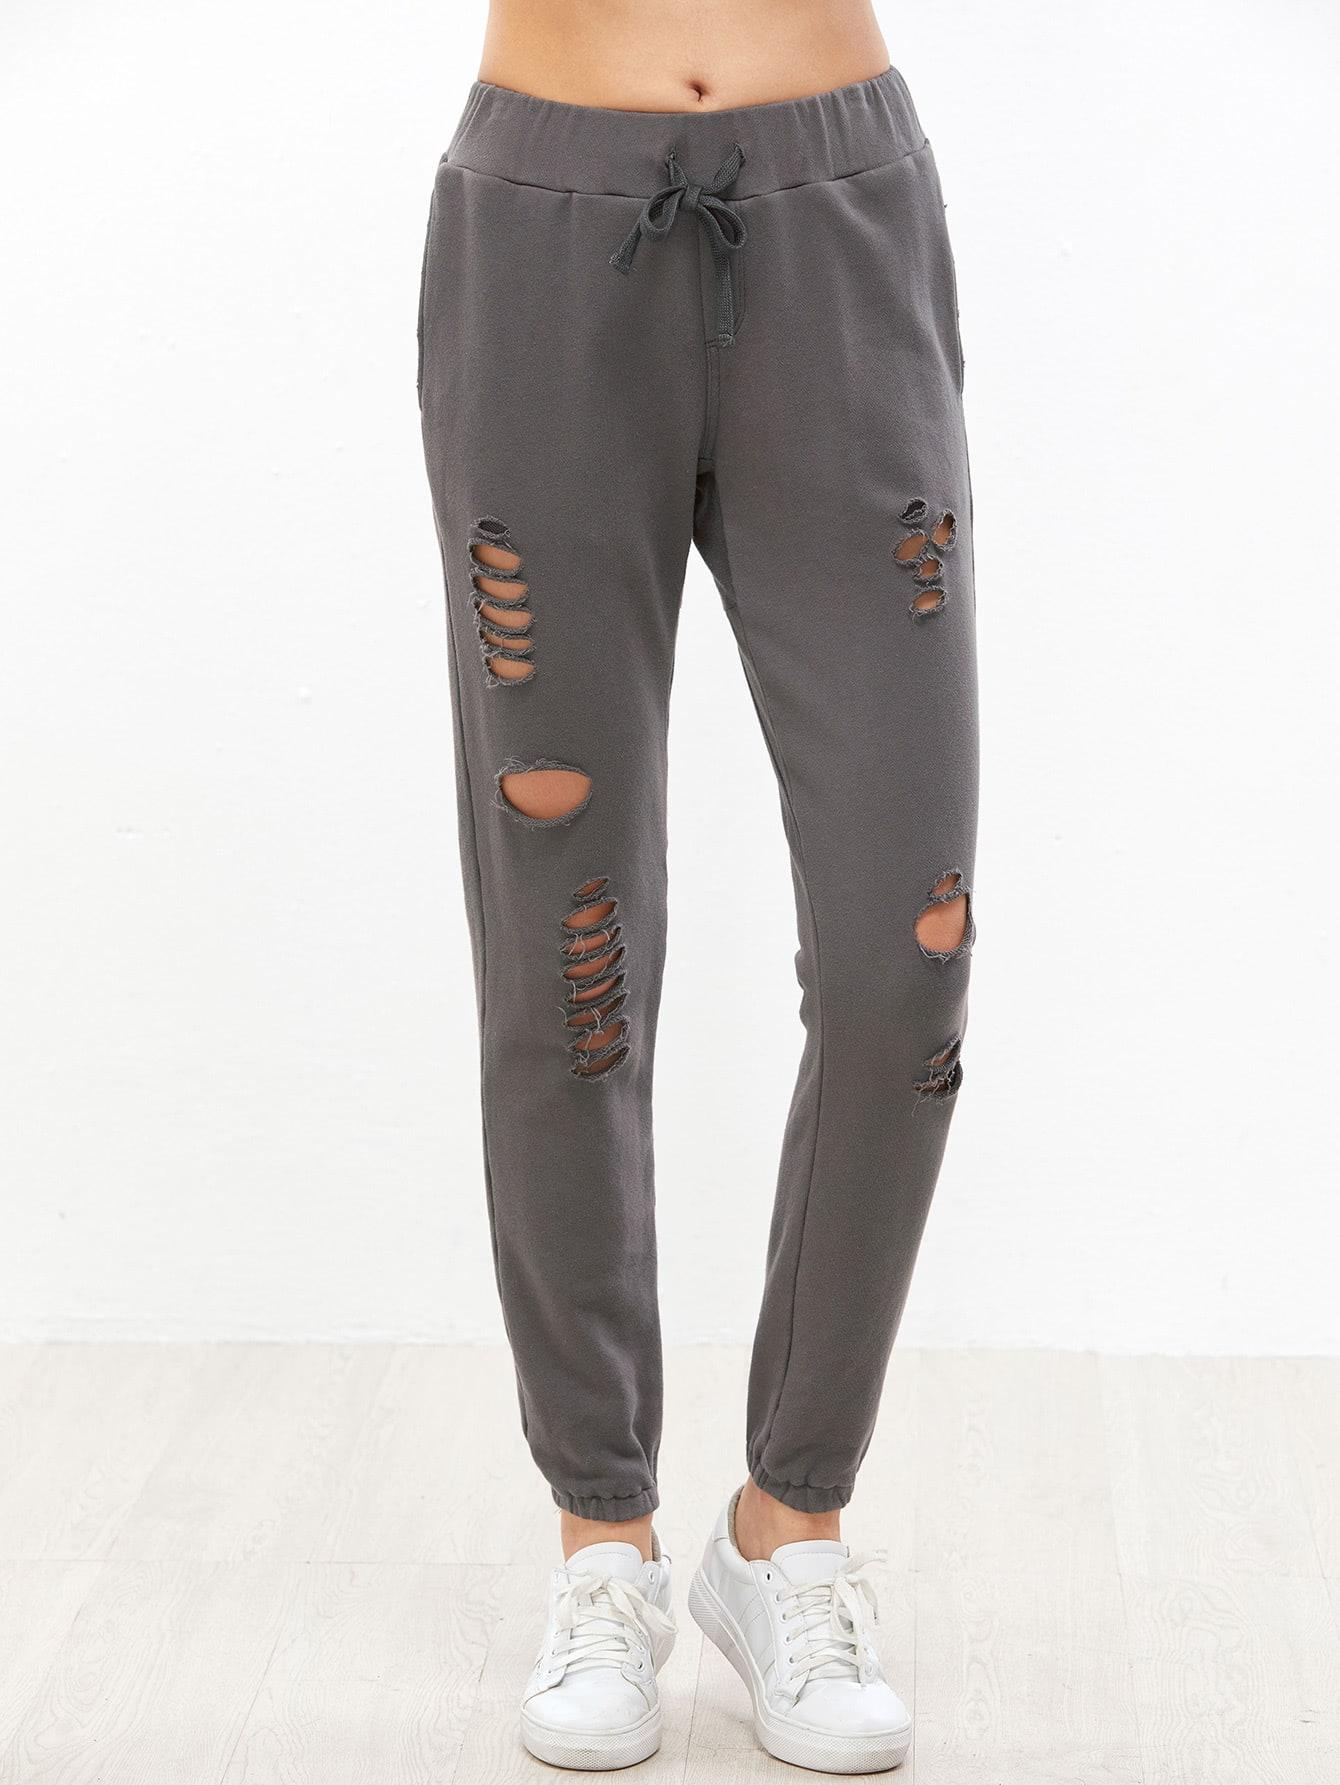 Grey Drawstring Waist Distressed Sweatpants pants161201702